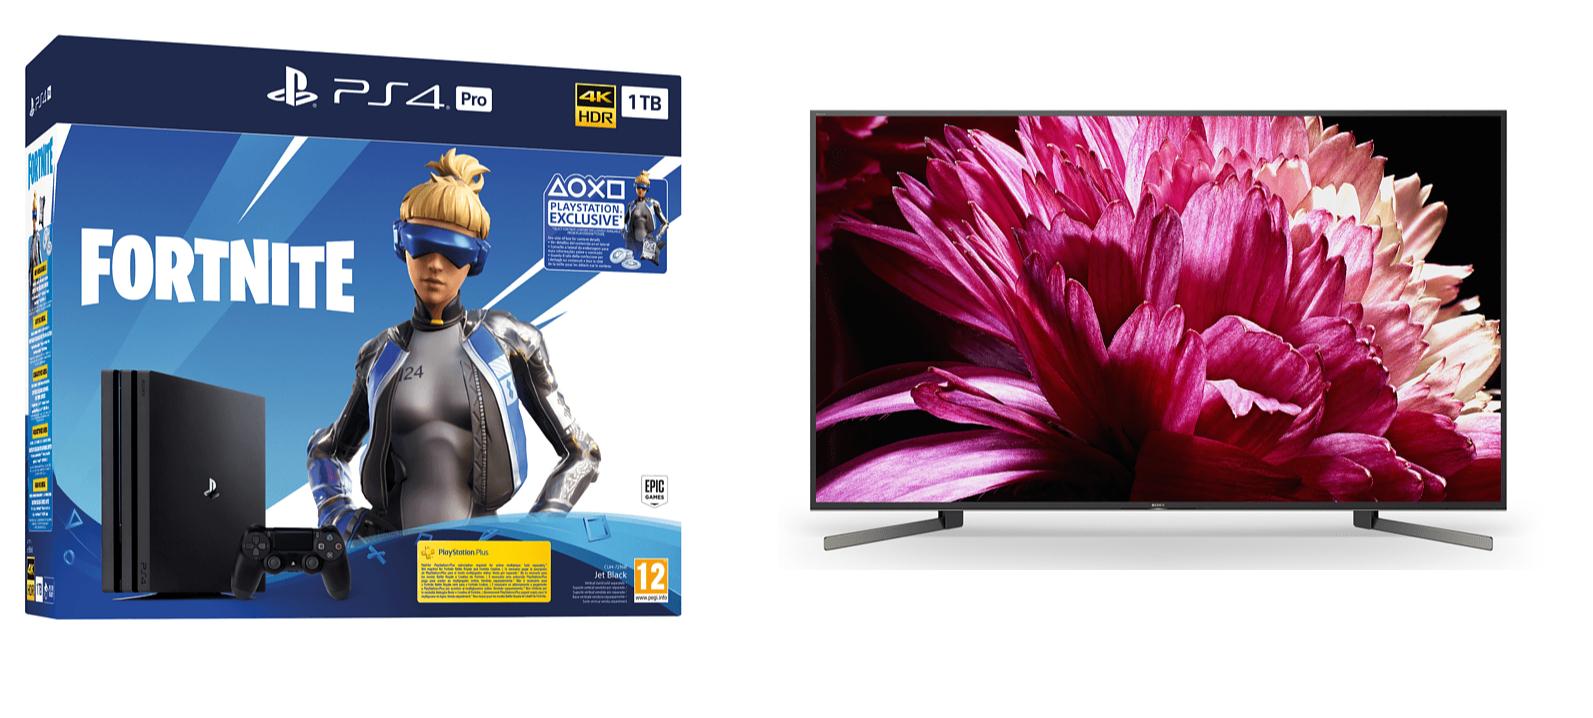 Tv Sony 55xg9505 + PS4 Pro GRATIS